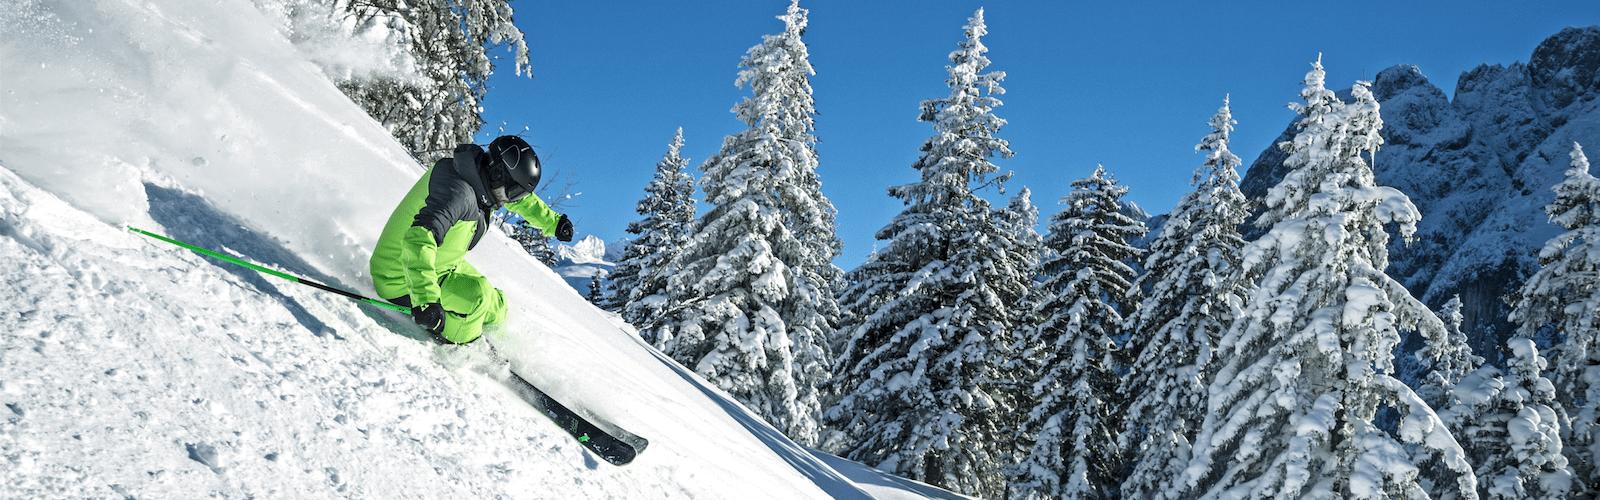 Sport Milanovic - Skifahren am Sonnenkopf